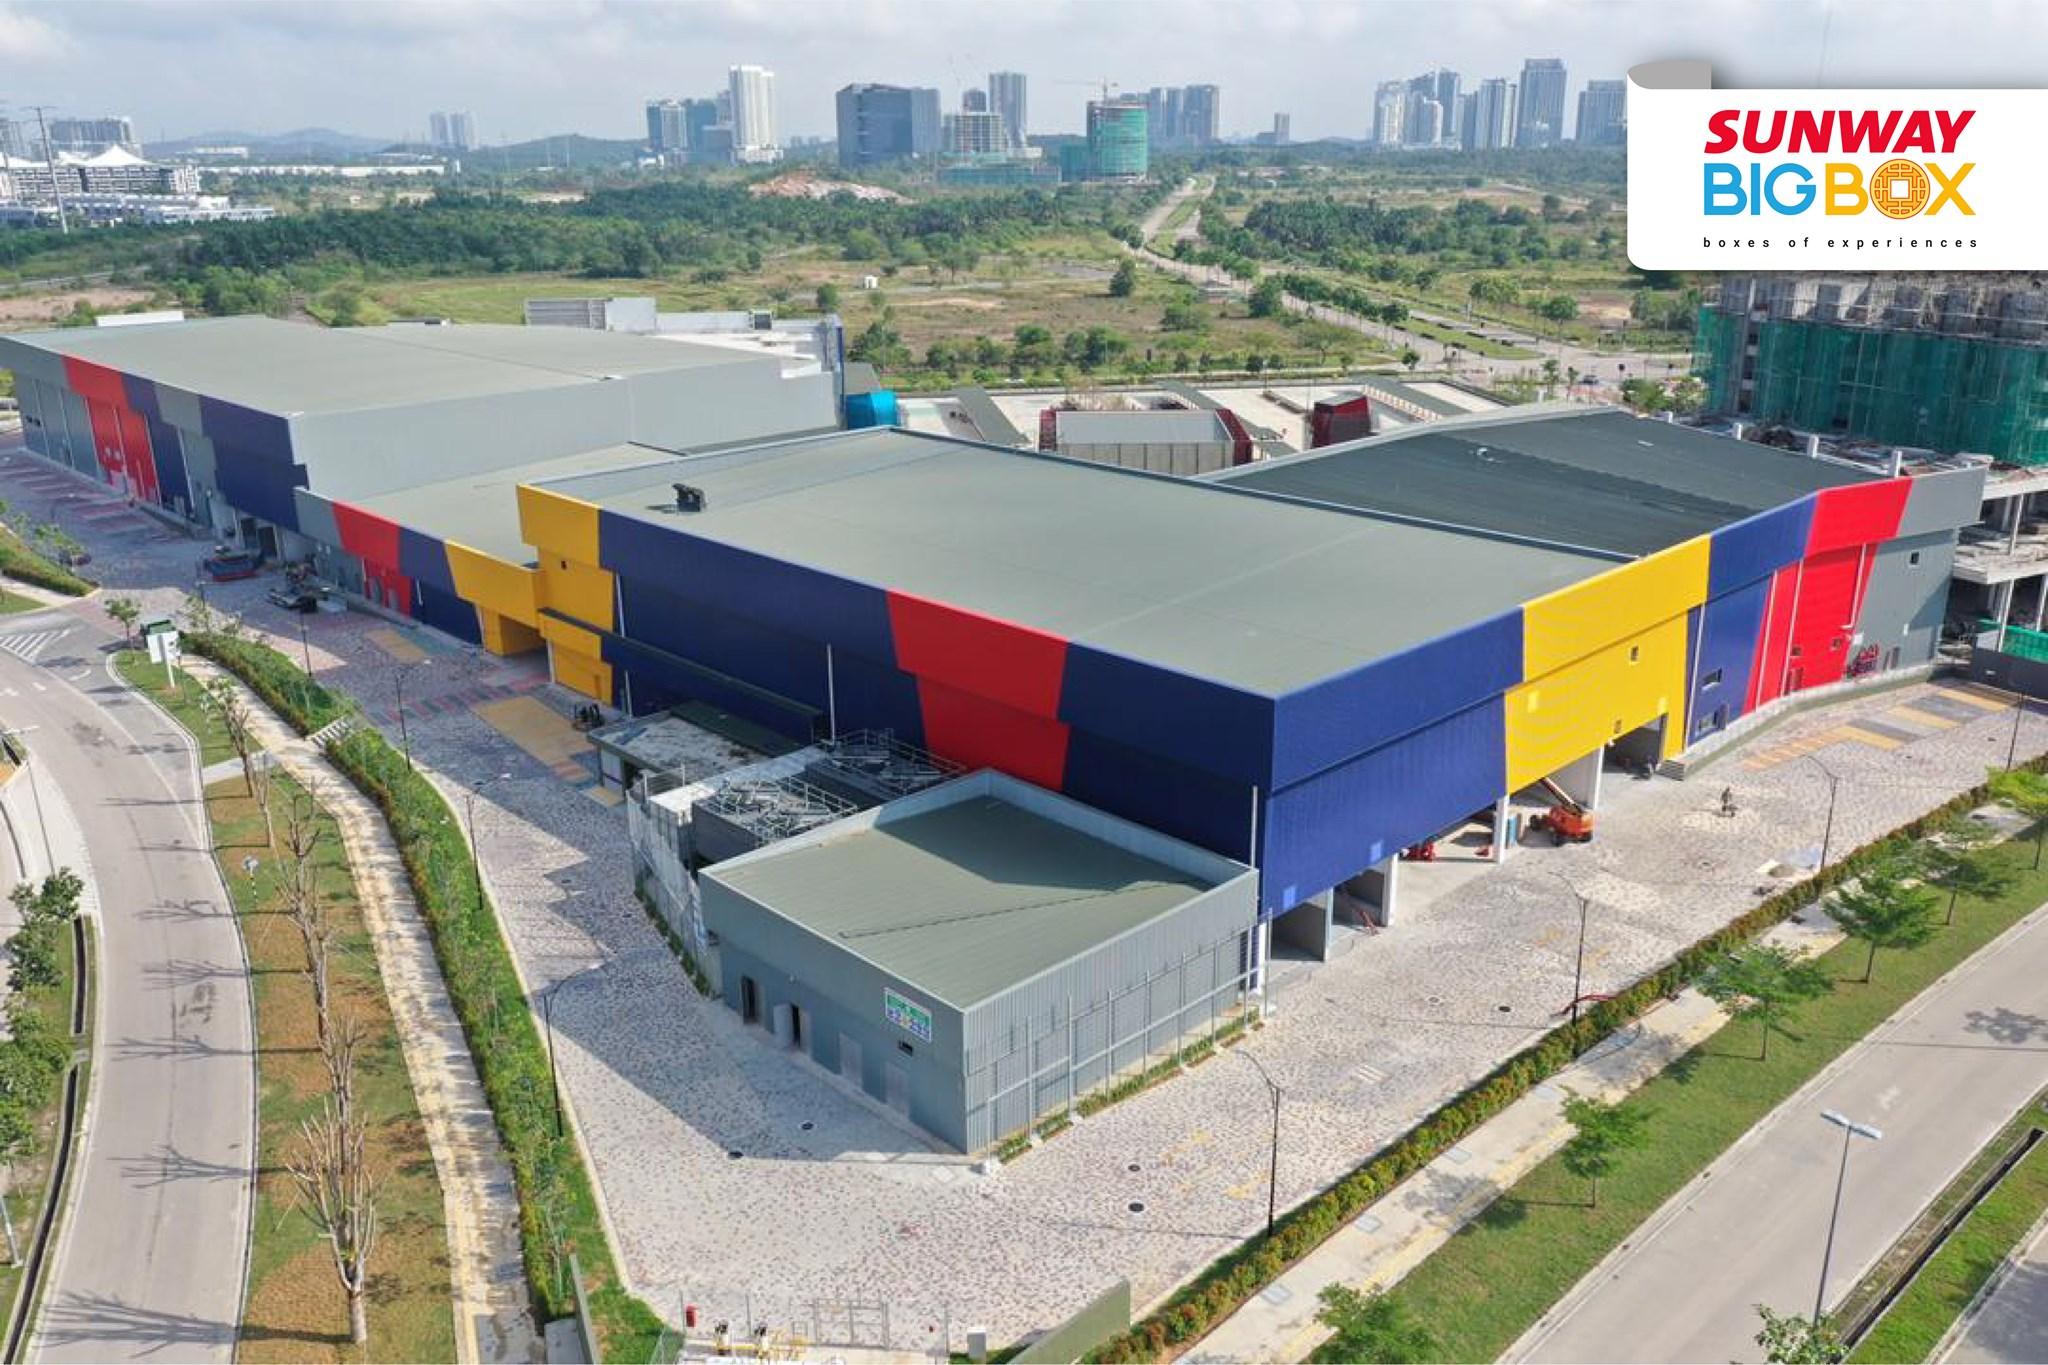 Sunway Big Box Johor Bahru